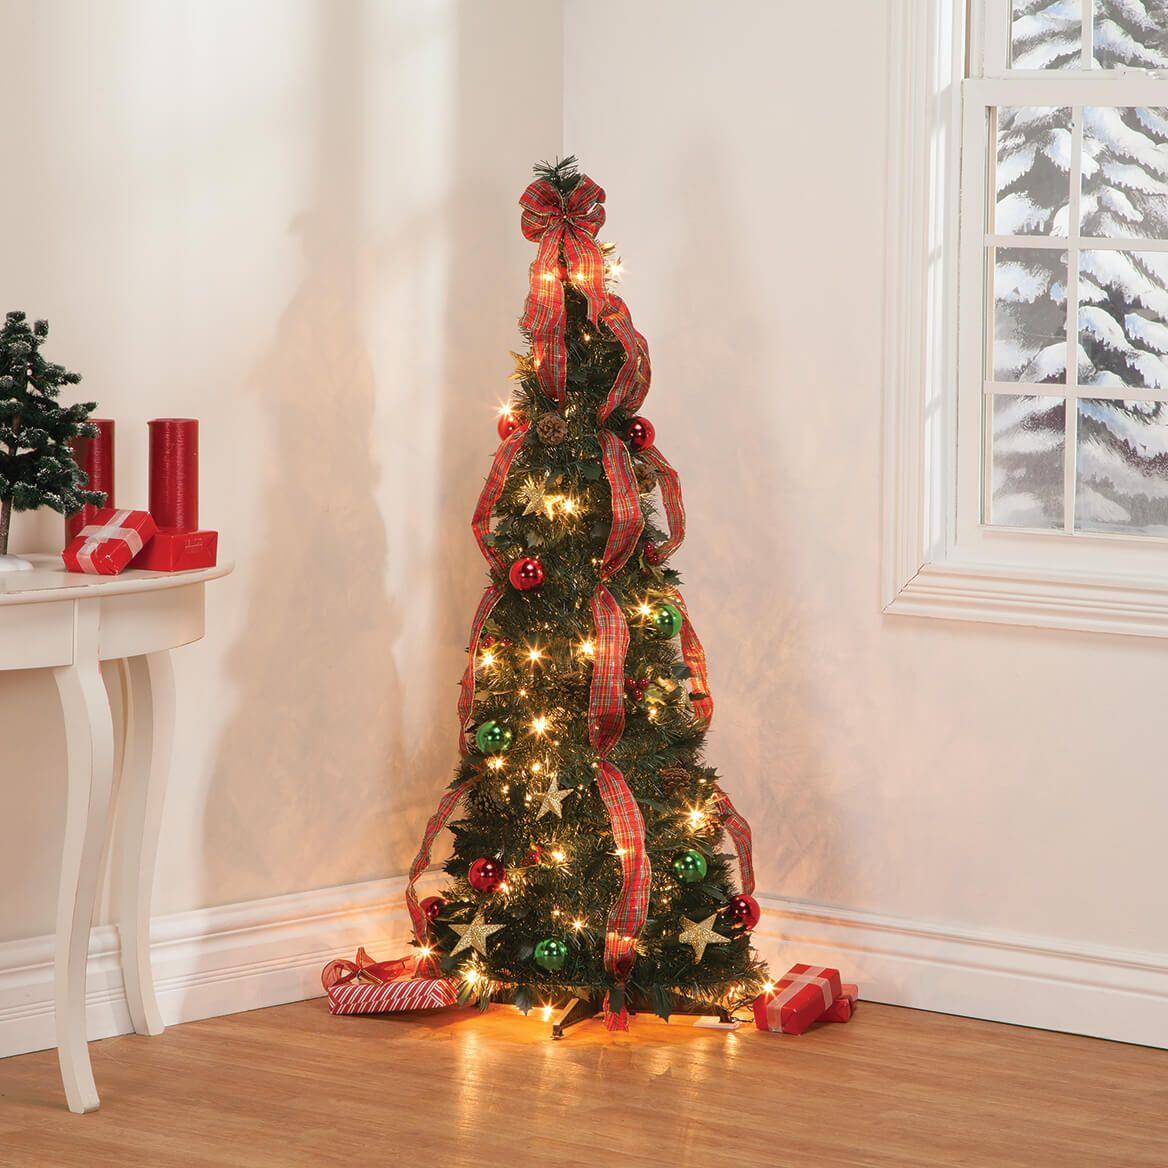 4' Plaid Pull-Up Tree by Holiday Peak™-368142